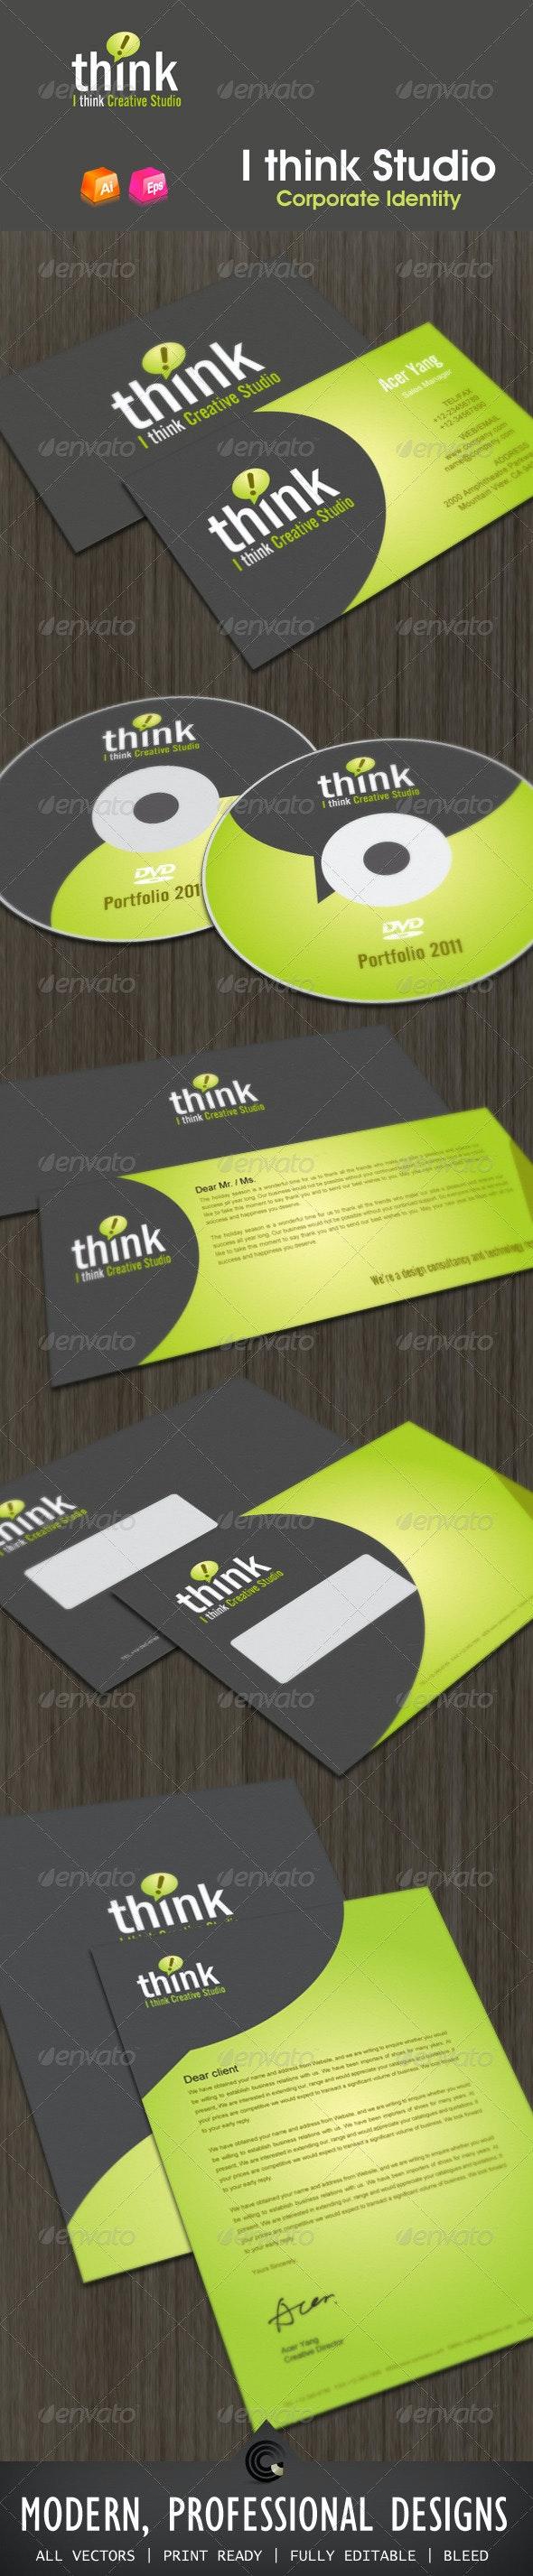 Ithink Studio Corporate Identity - Stationery Print Templates